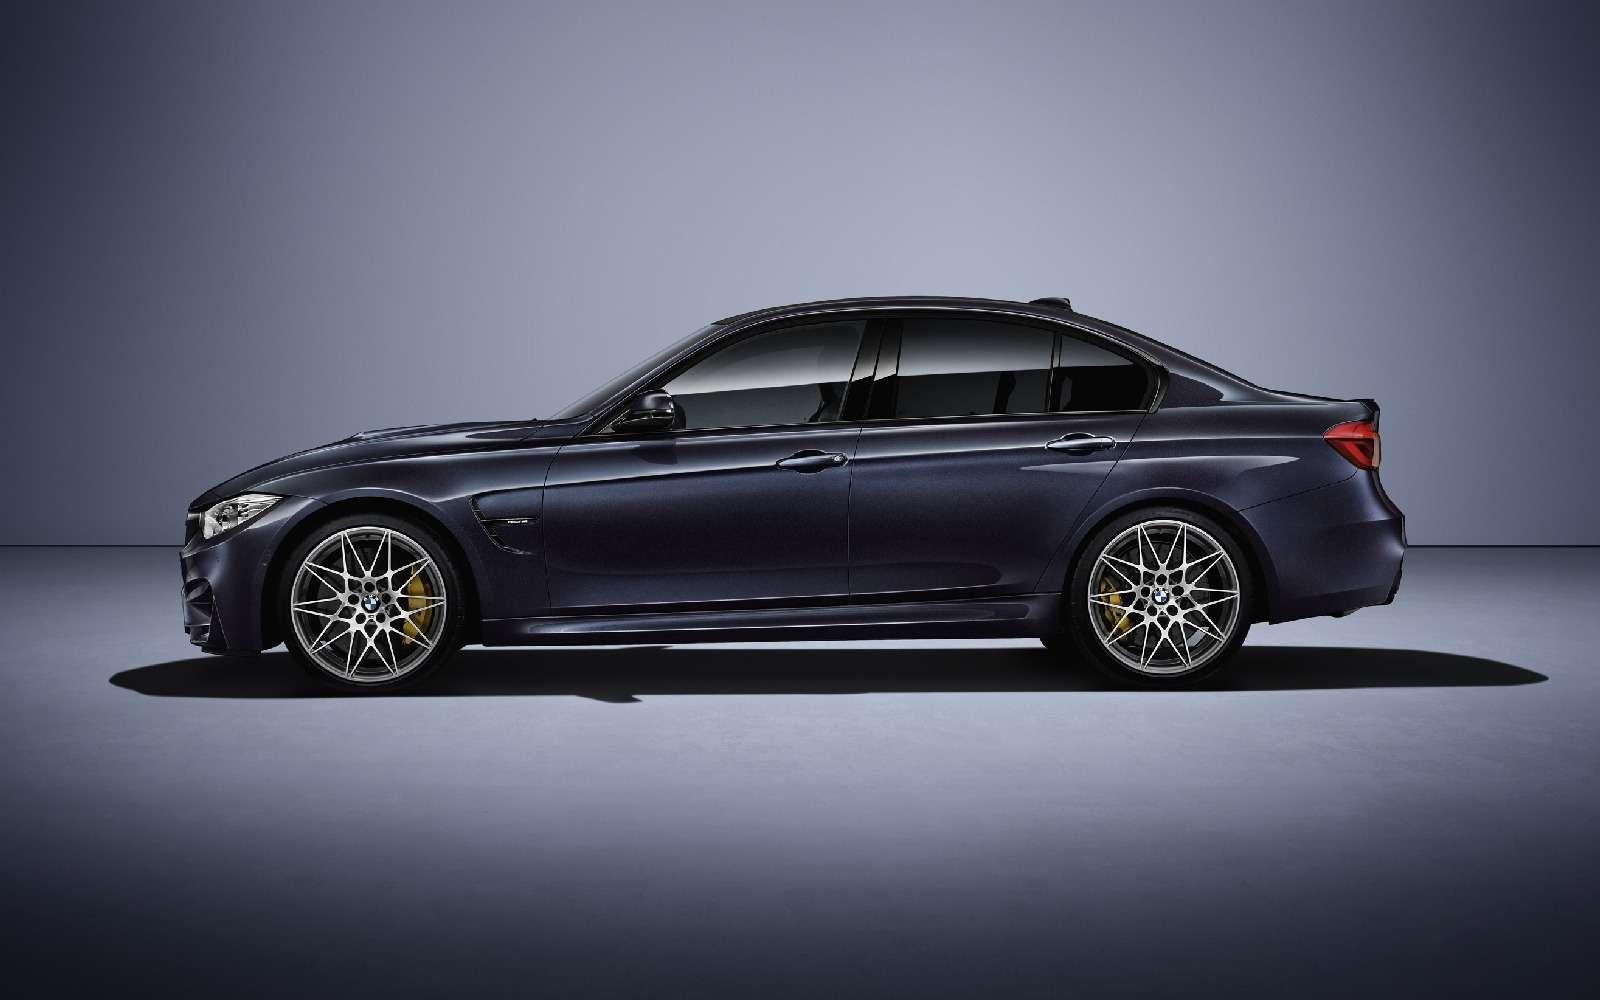 BMWM3отпразднует 30-летний юбилей с«лишними» дверьми— фото 593120